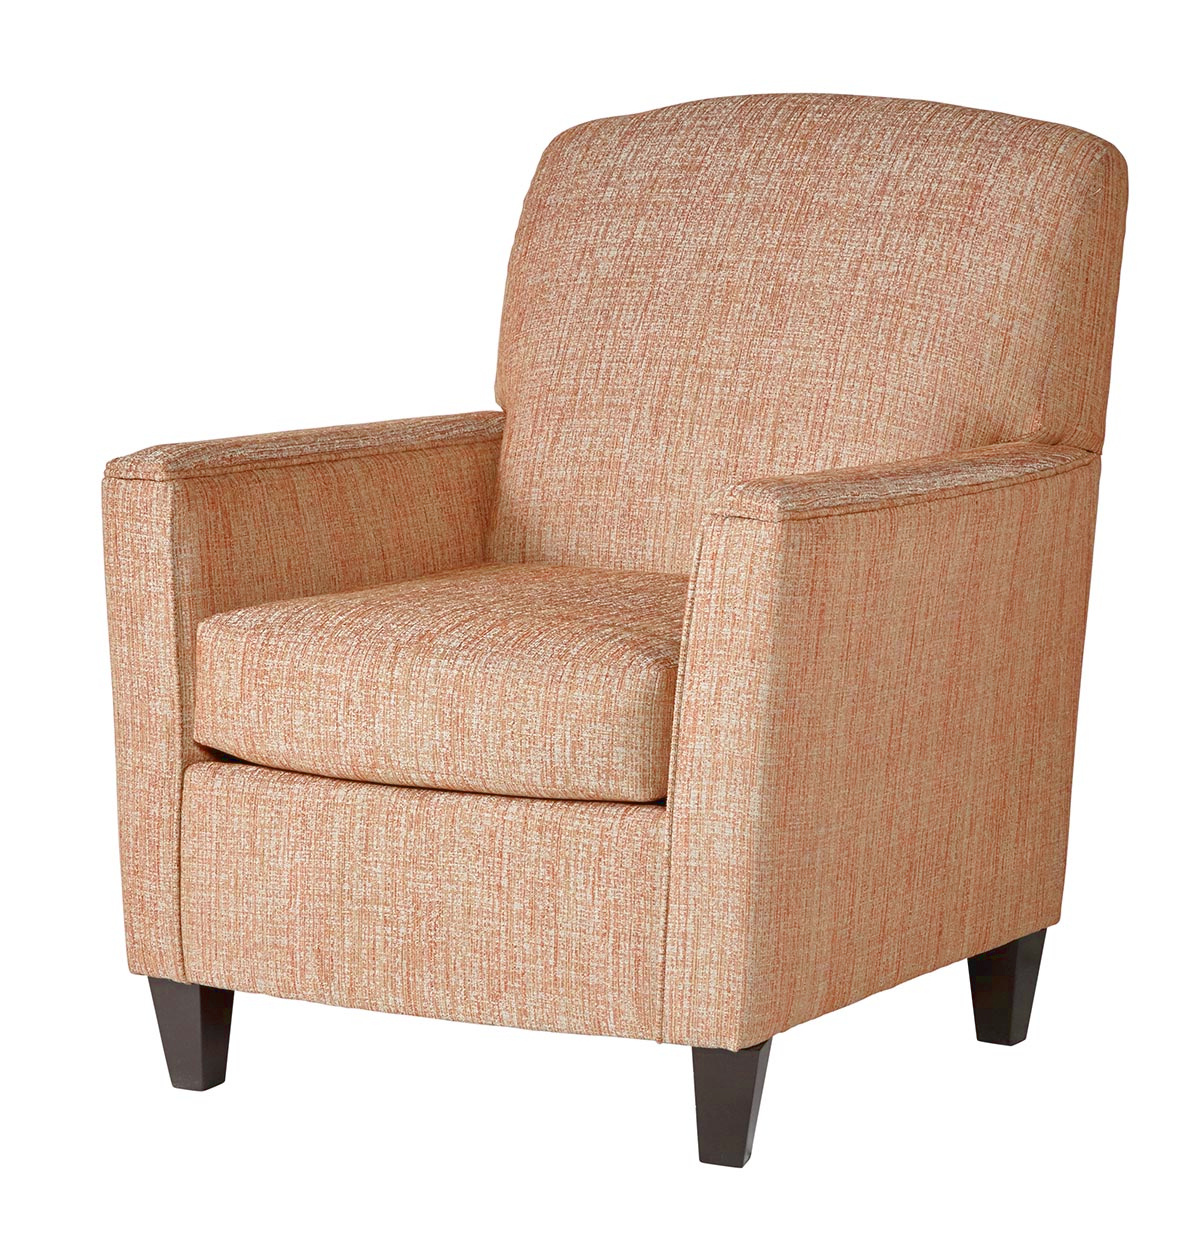 35FOCA Serta Accent Chair